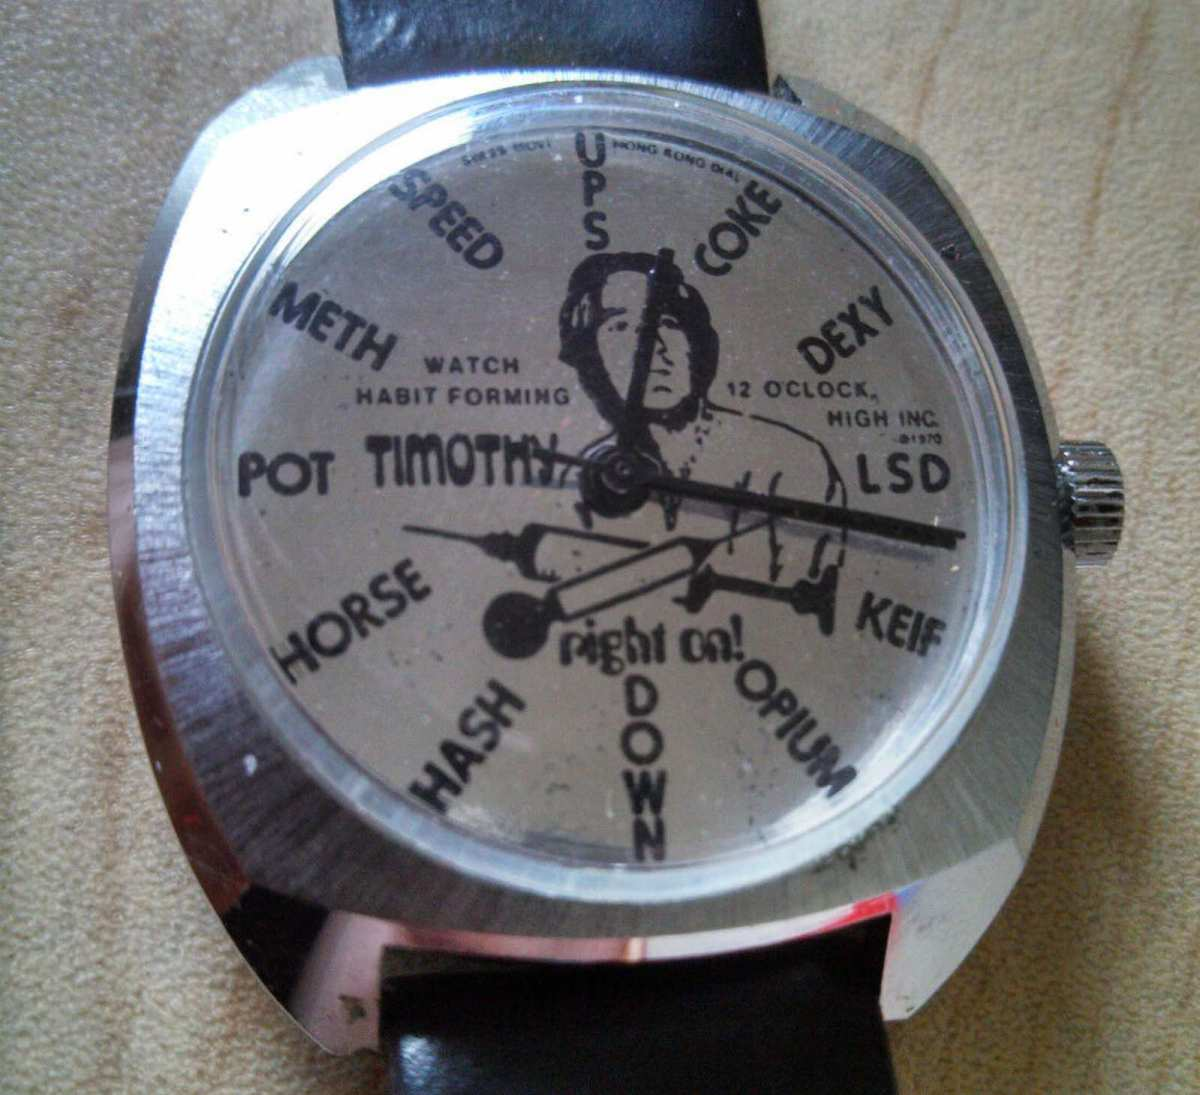 Timothy Leary vintage wristwatch on eBay